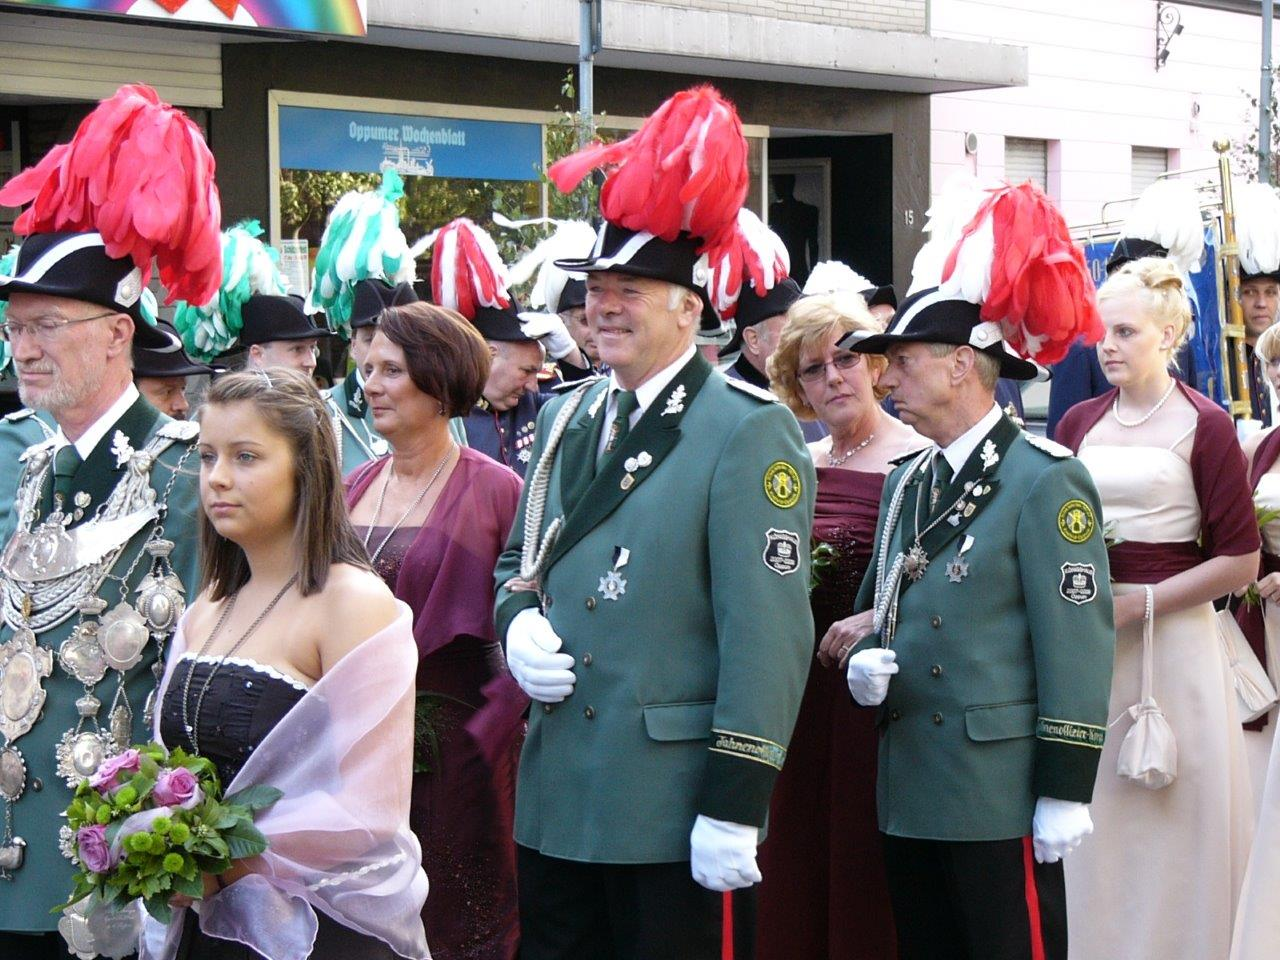 2009 Schützenfest Tiefers 357